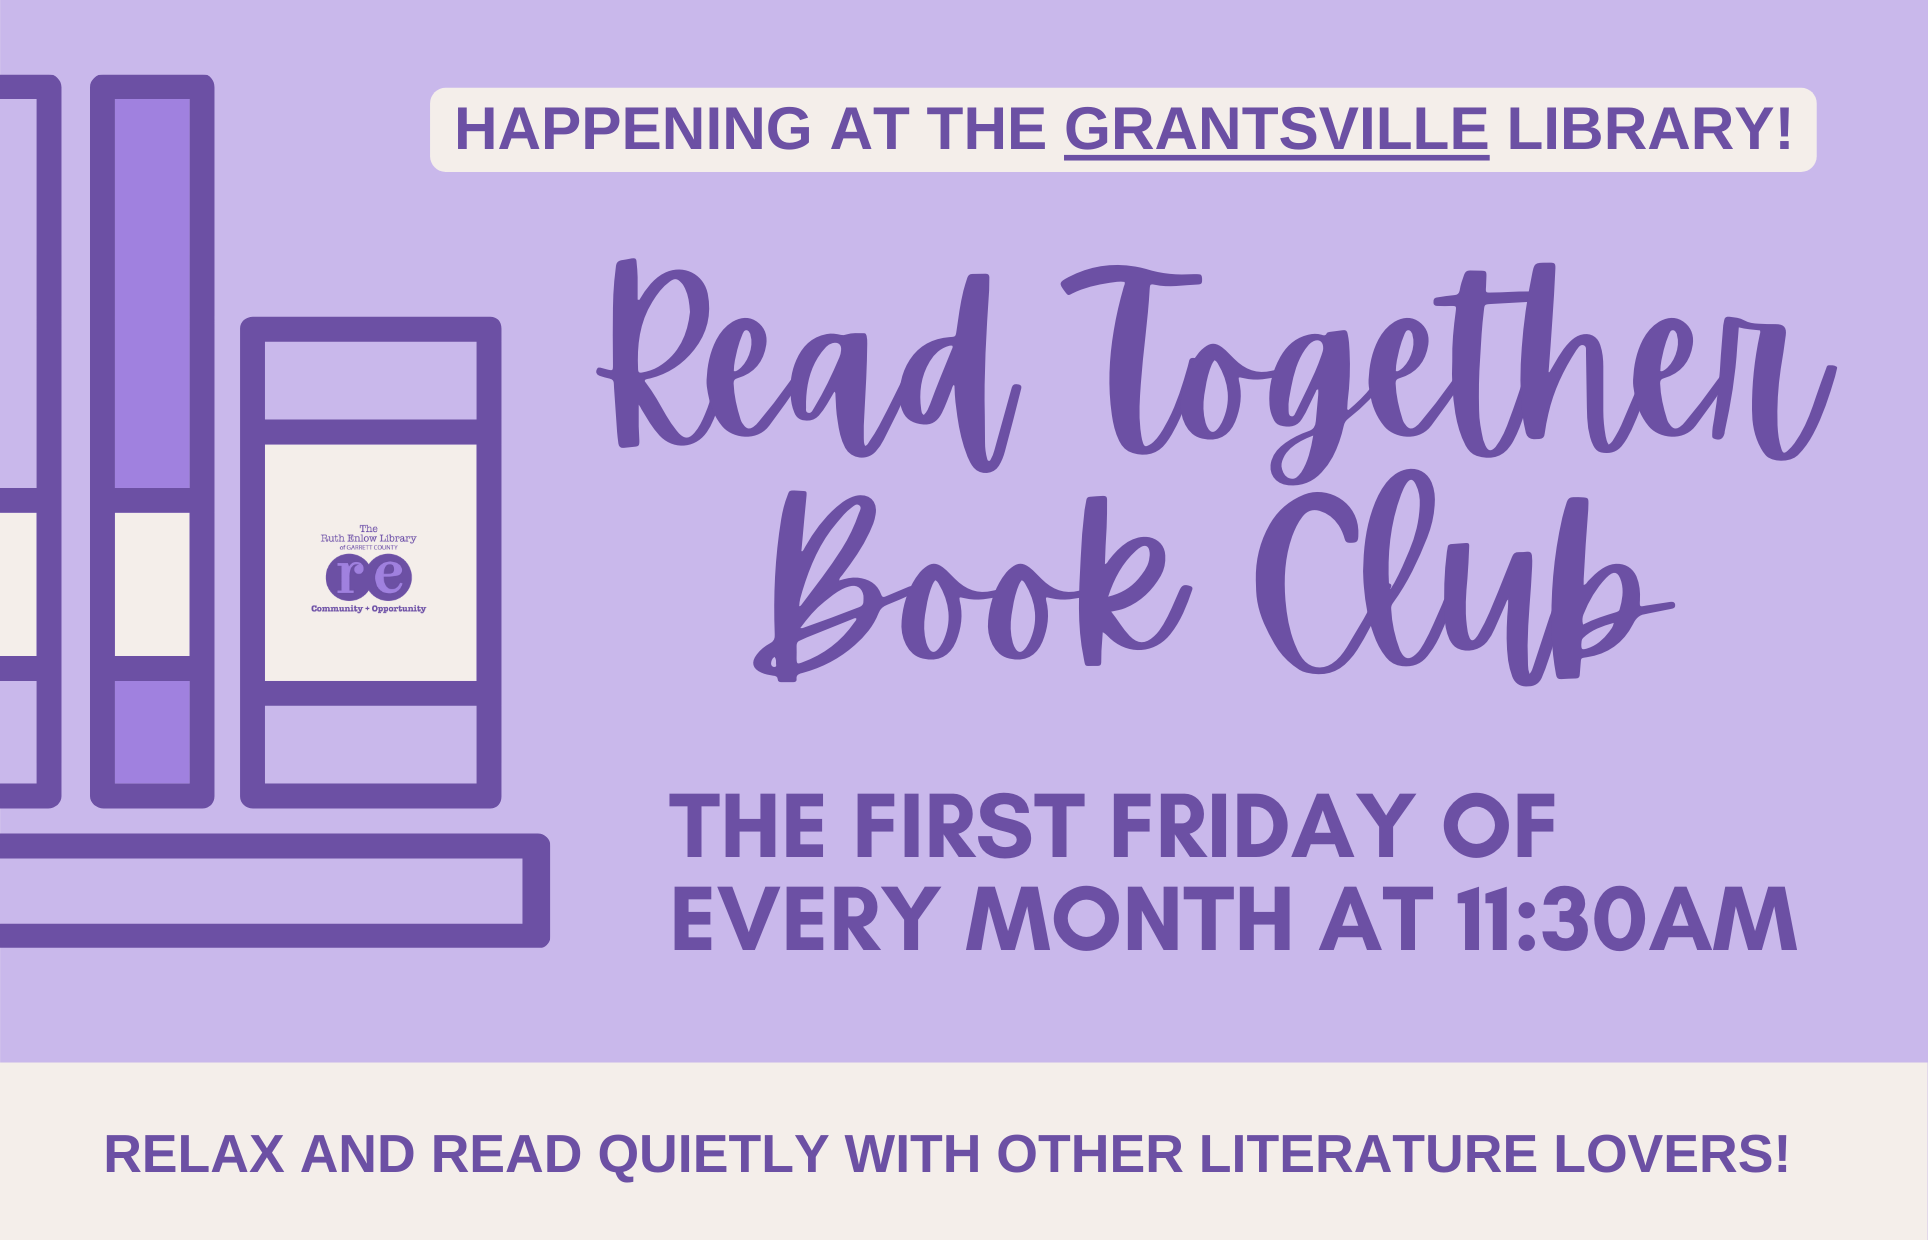 Grantsville Read Together Book Club